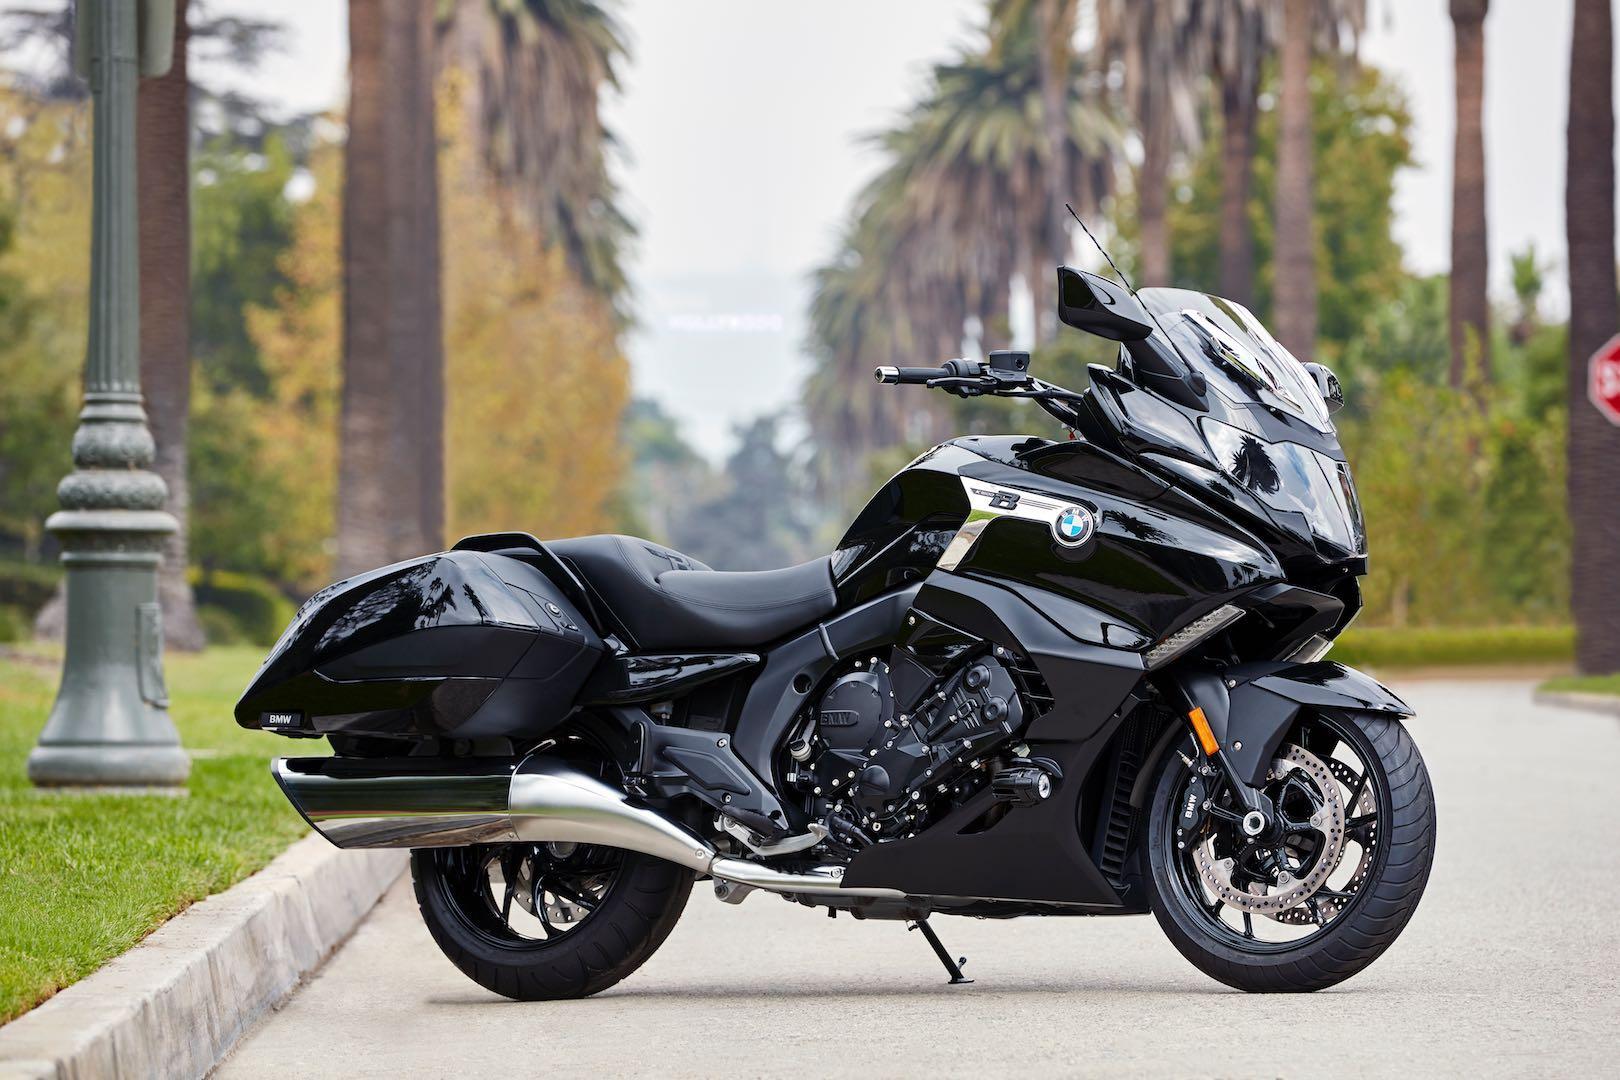 bmw k 1600 b bagger demo rides 2017 sturgis motorcycle rally. Black Bedroom Furniture Sets. Home Design Ideas